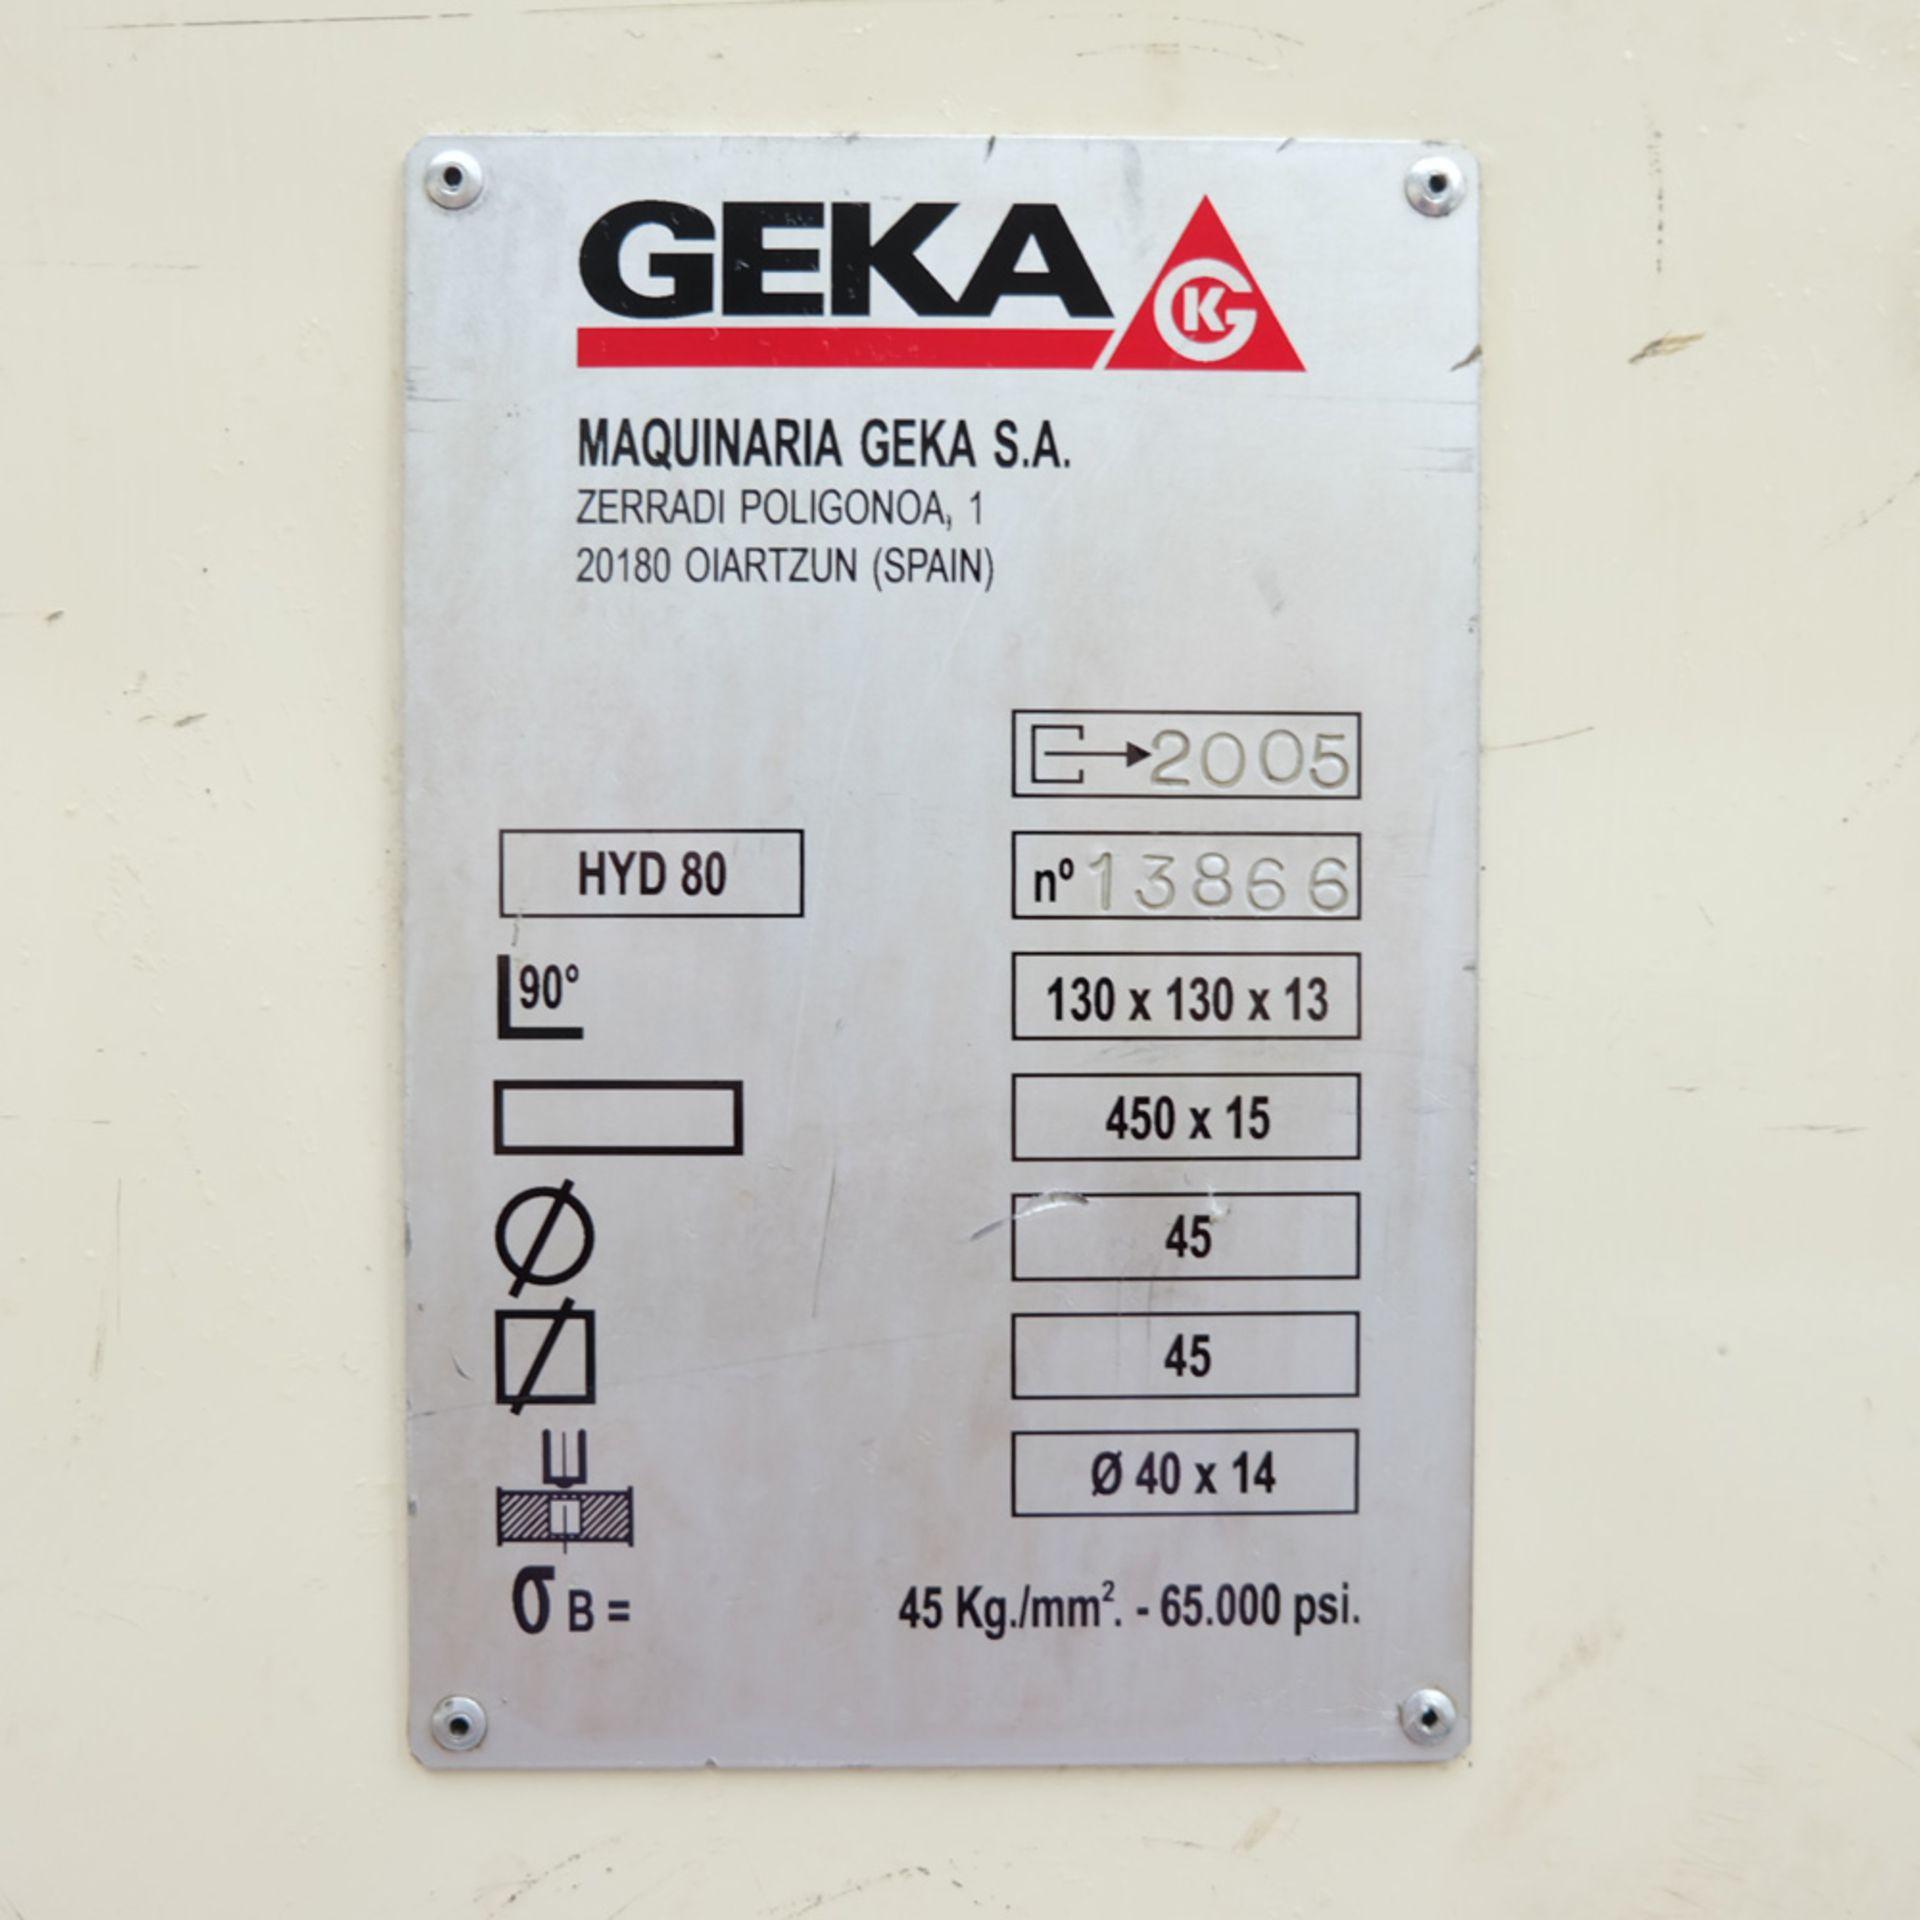 GEKA Model HYD 80/A Universal Steelworker - Image 13 of 21